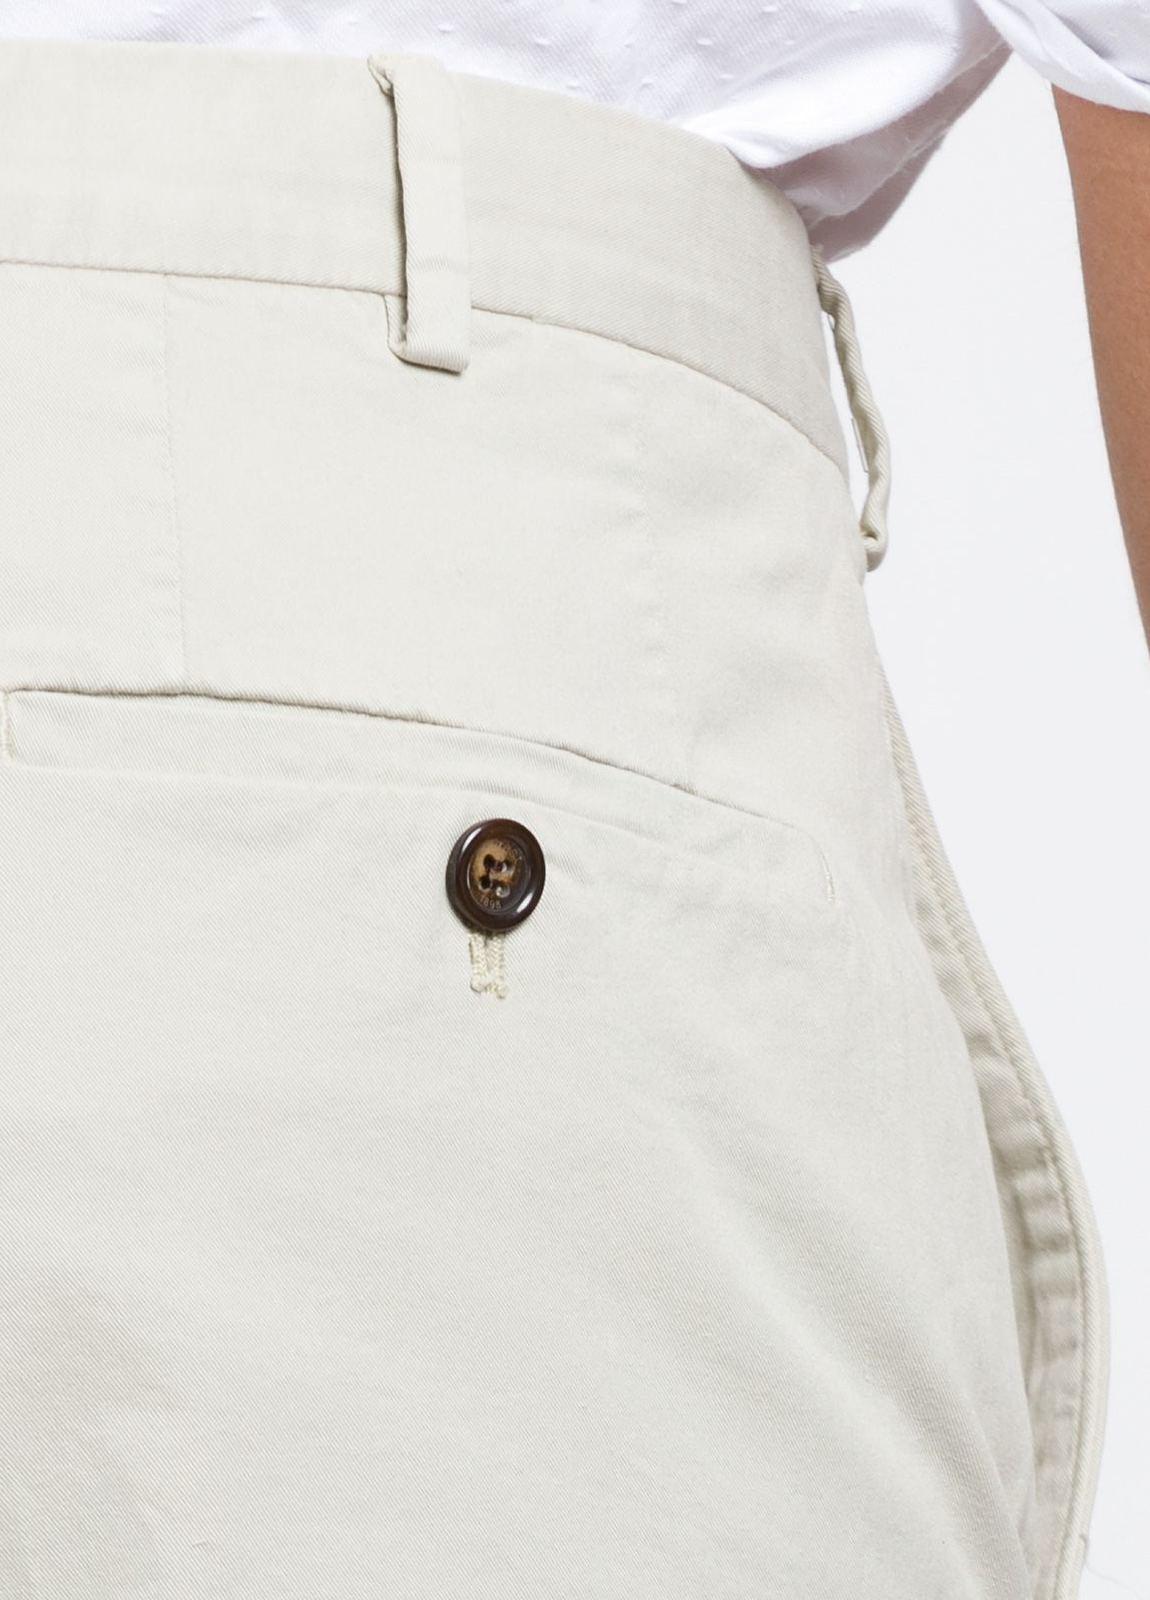 Pantalón Sport SLIM FIT , modelo INCO, color beige, 98% Algodón 2% Elastano. - Ítem4